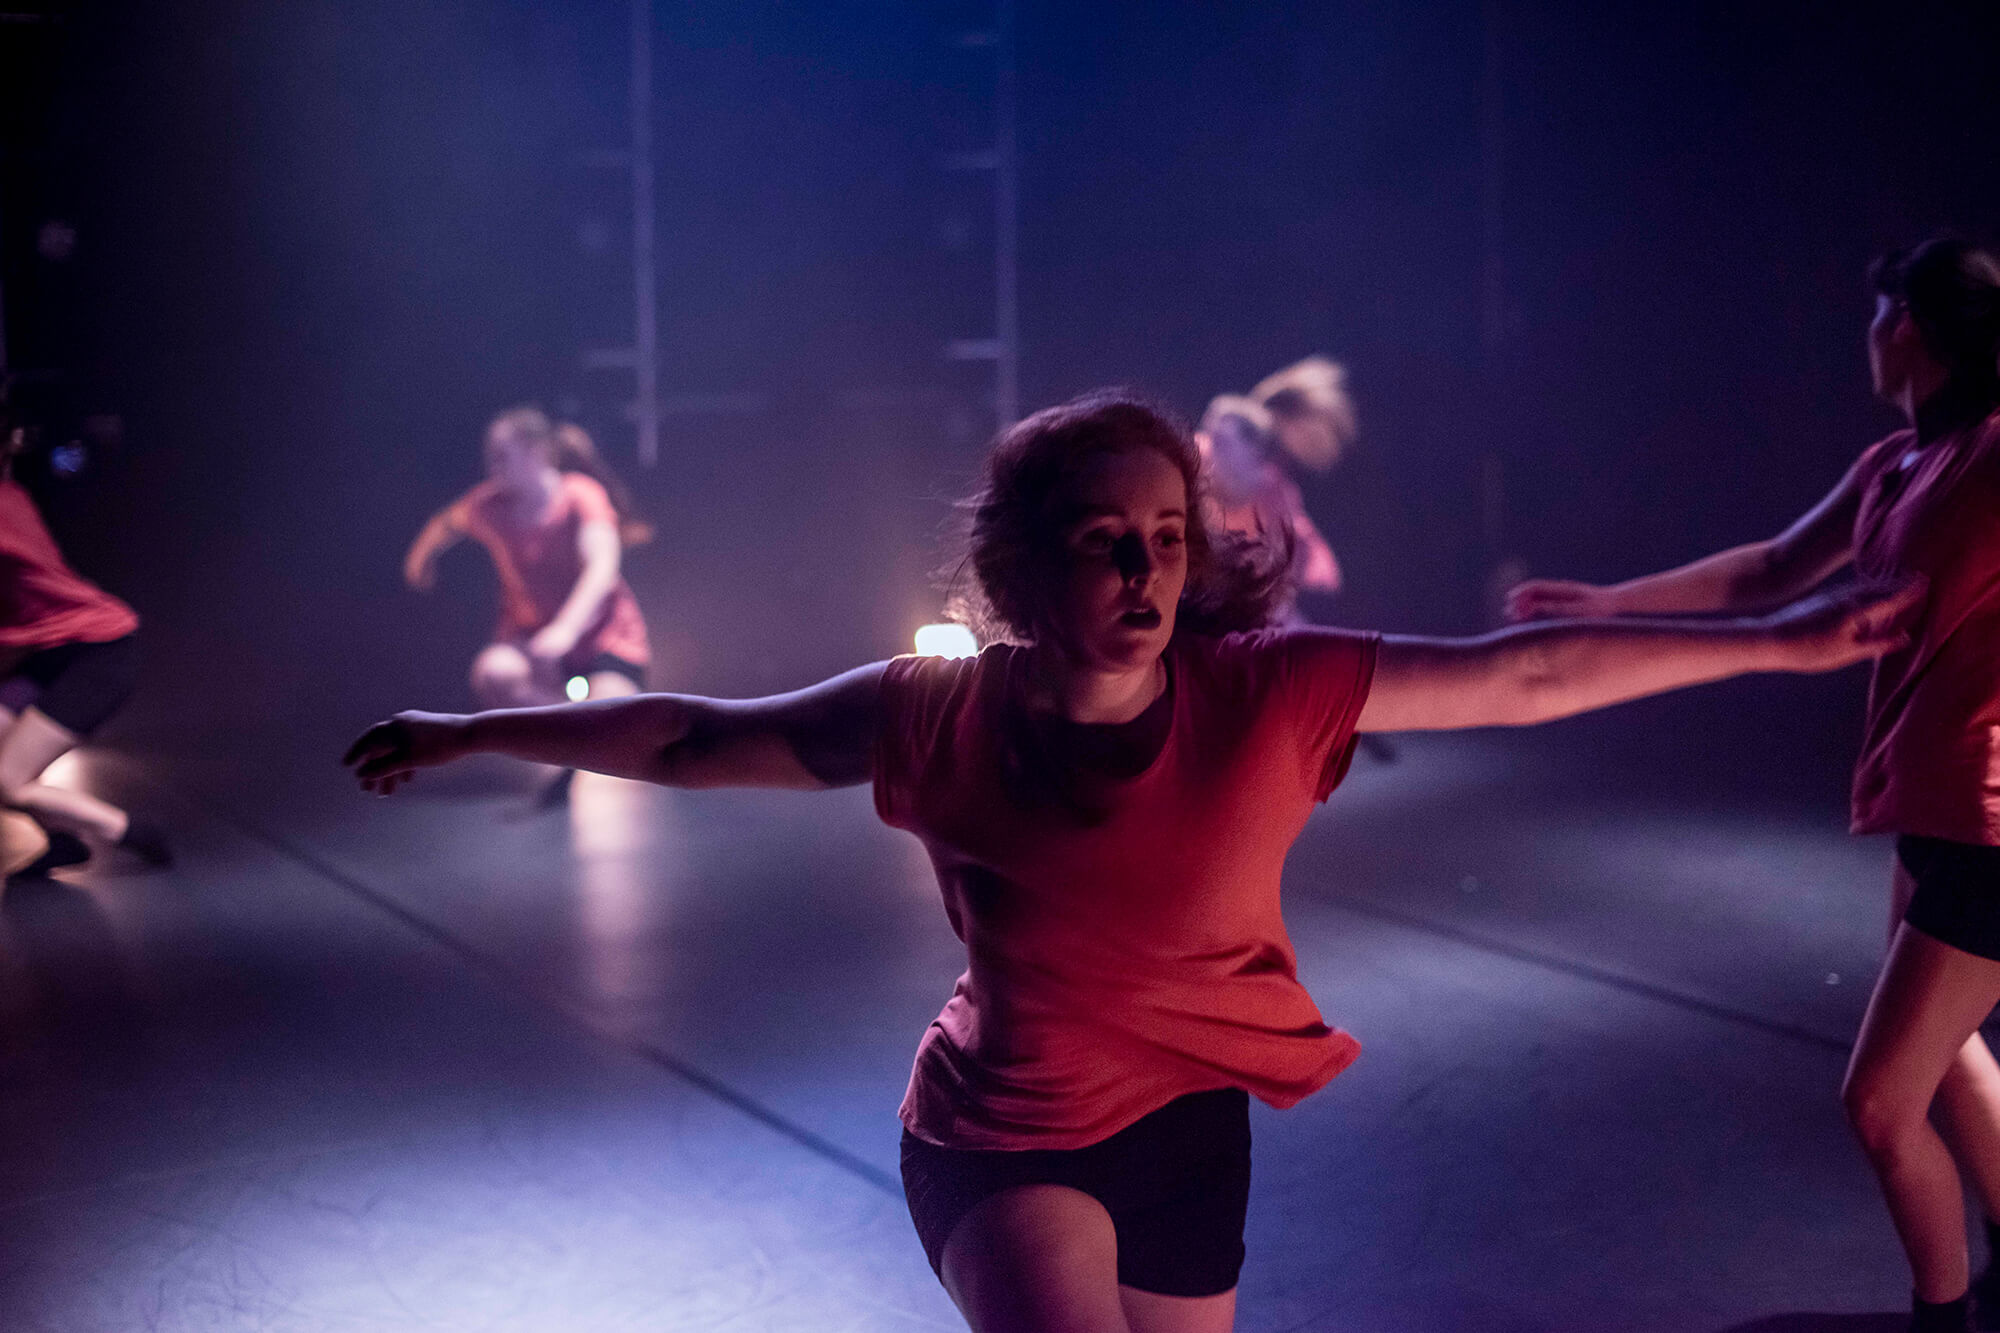 Students perform an interpretive dance routine